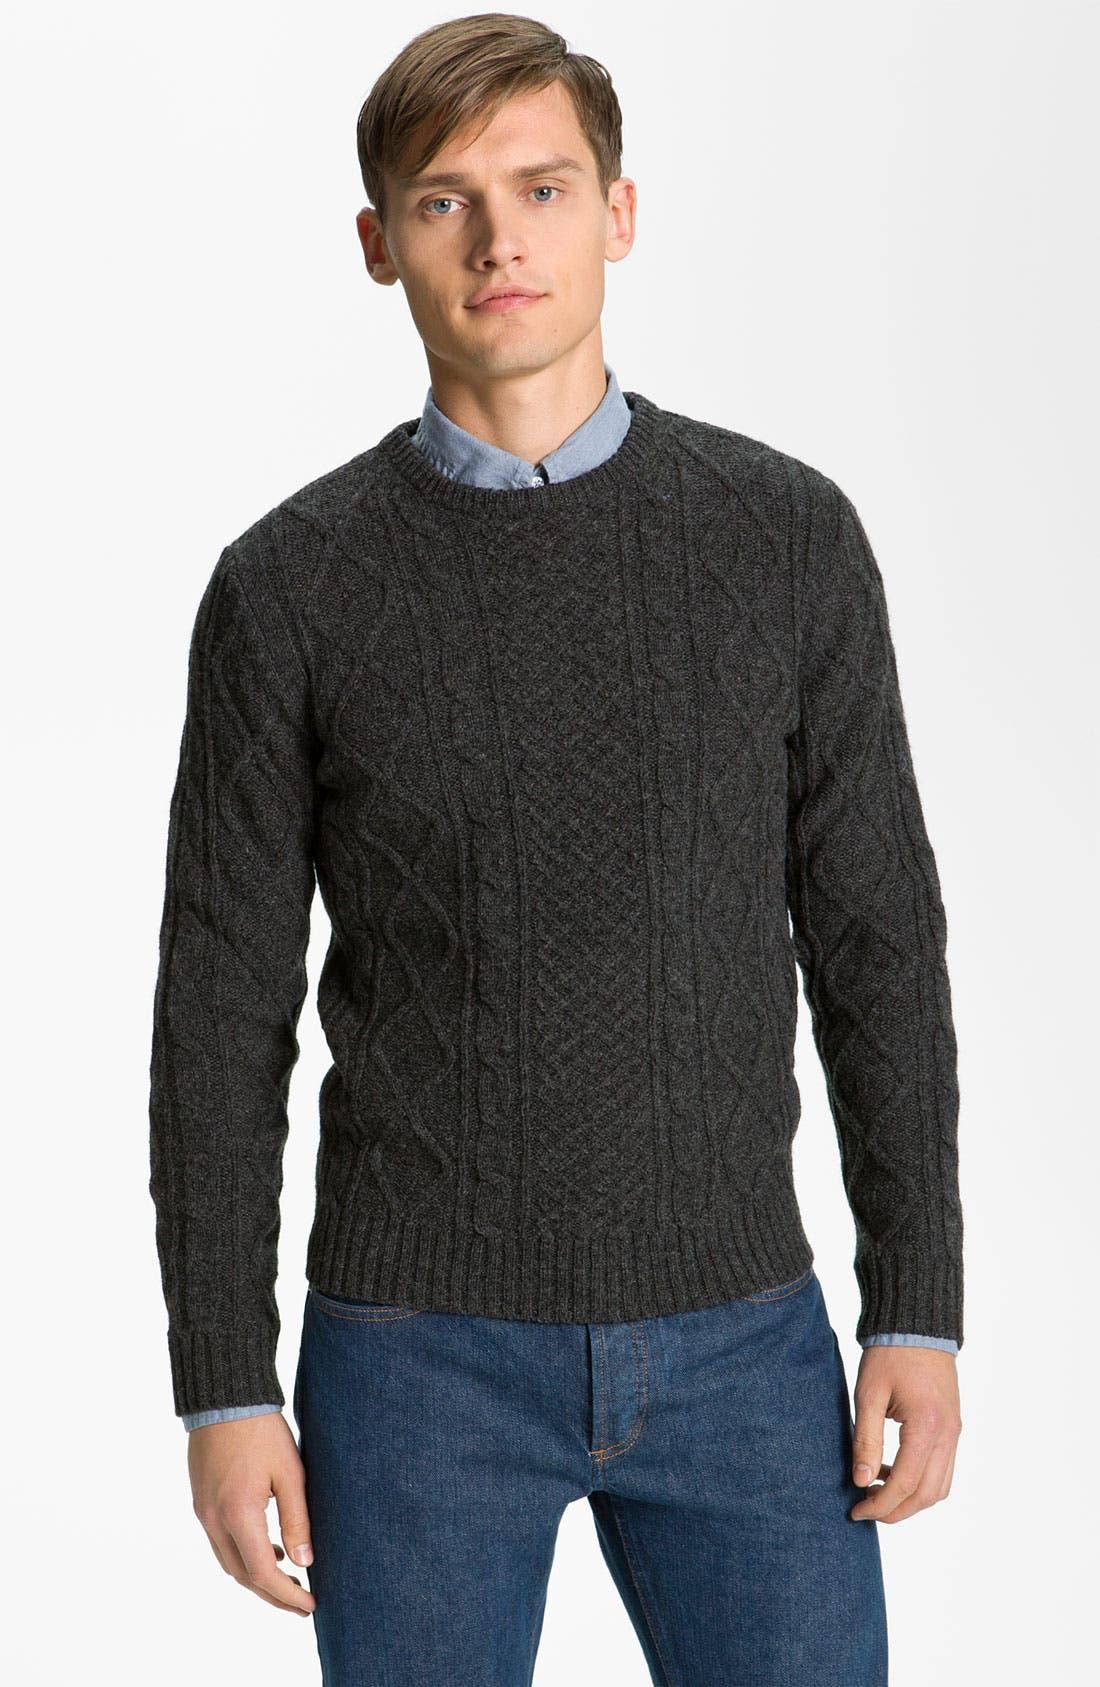 A.P.C., 'Fisherman's' Lambswool Sweater, Main thumbnail 1, color, 021